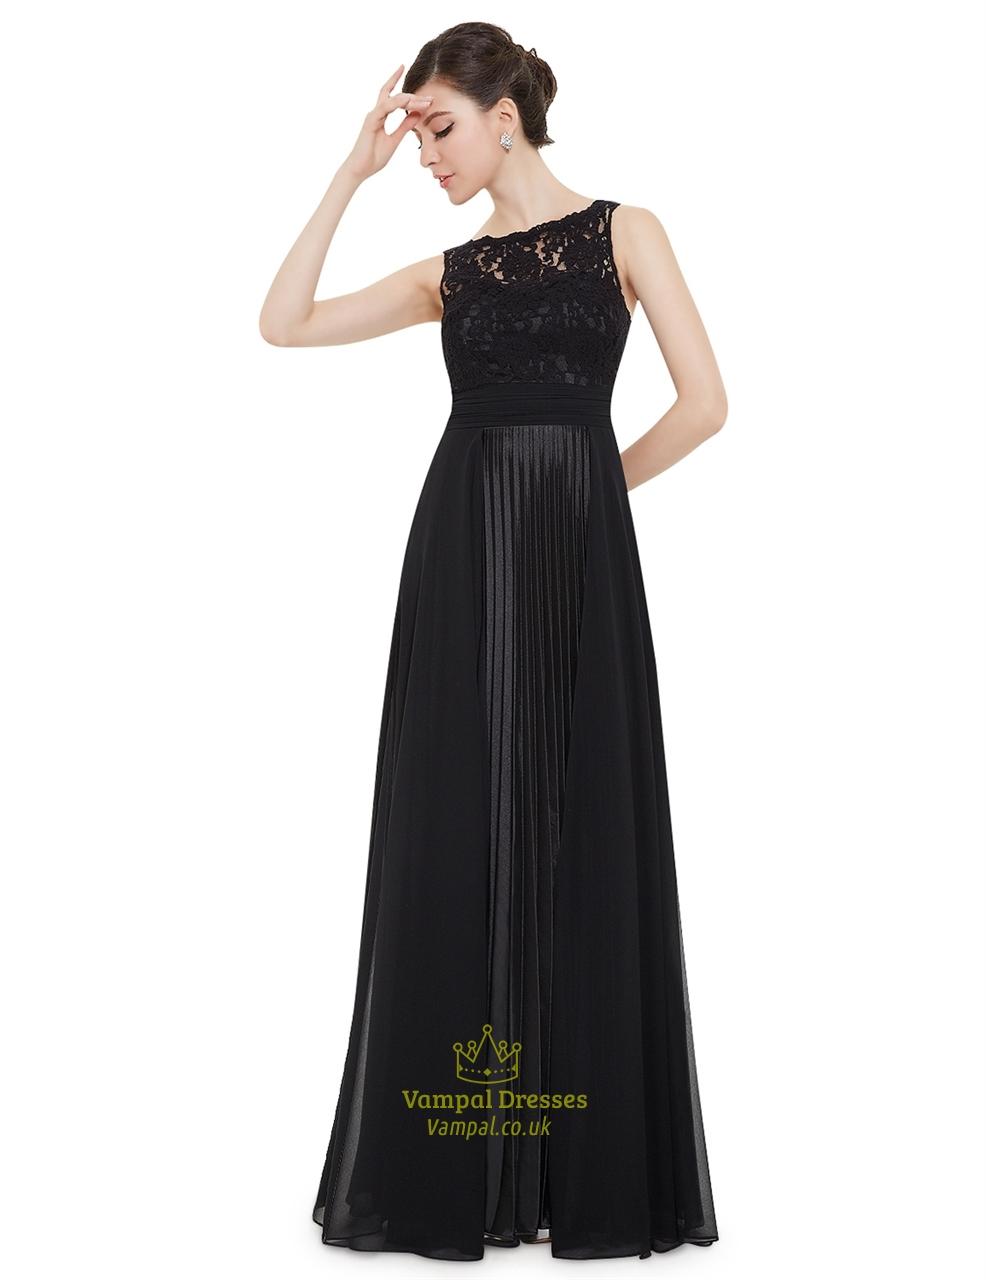 Elegant black lace illusion neckline chiffon long bridesmaid dress elegant black lace illusion neckline chiffon long bridesmaid dress ombrellifo Choice Image